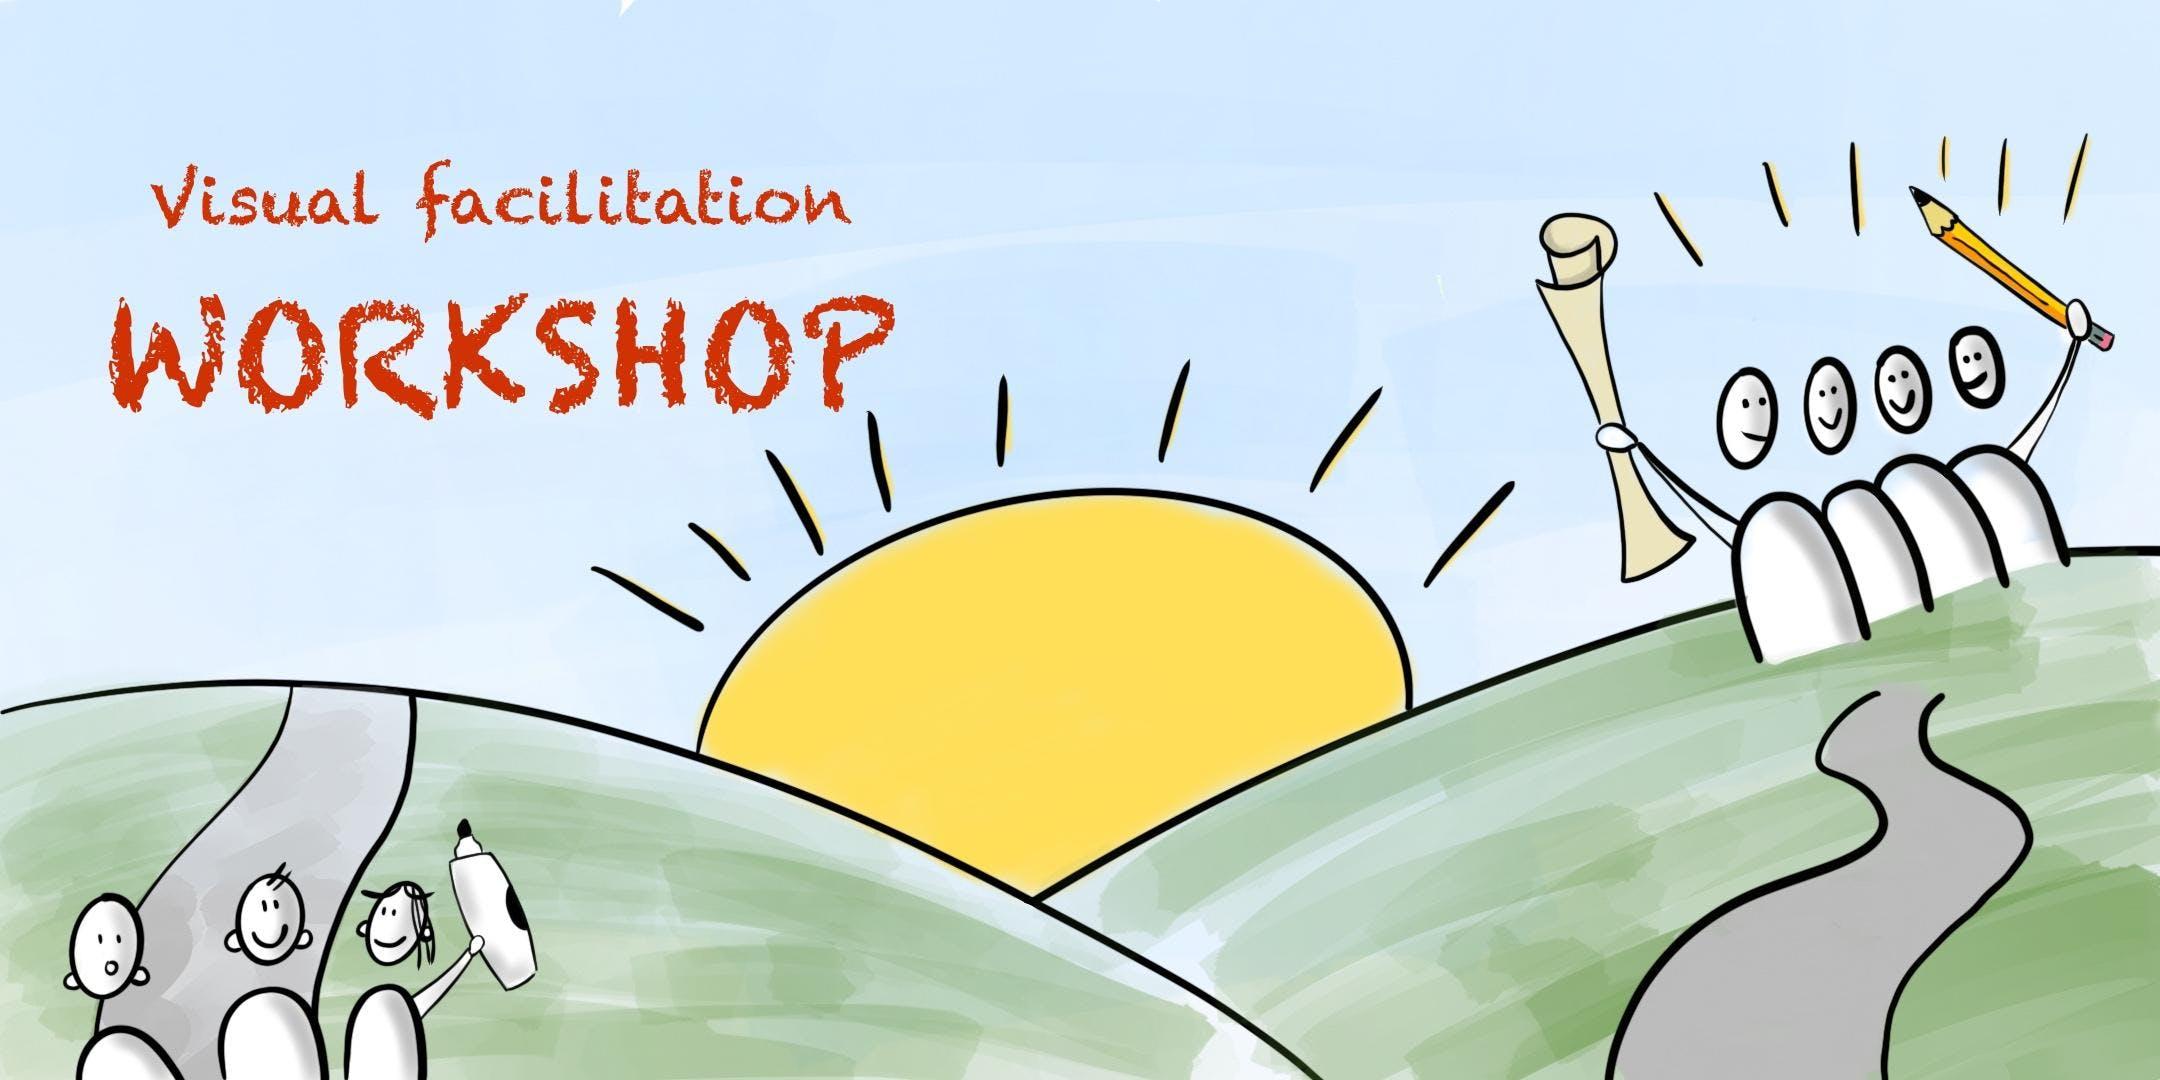 Visual facilitation essentials